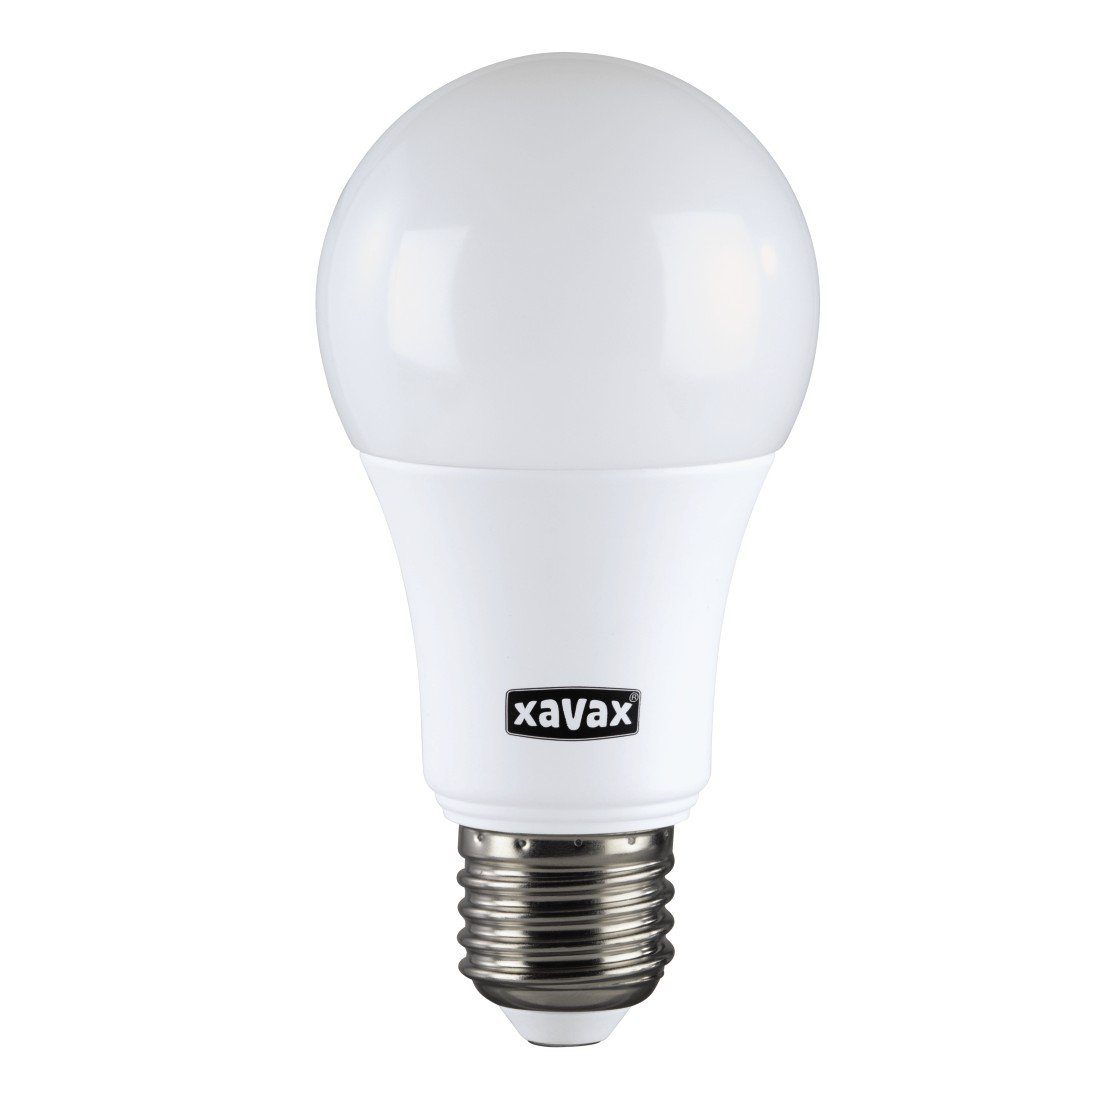 Xavax LED-Lampe, E27, 806lm ersetzt 60W Glühlampe, Warmweiß, RA90